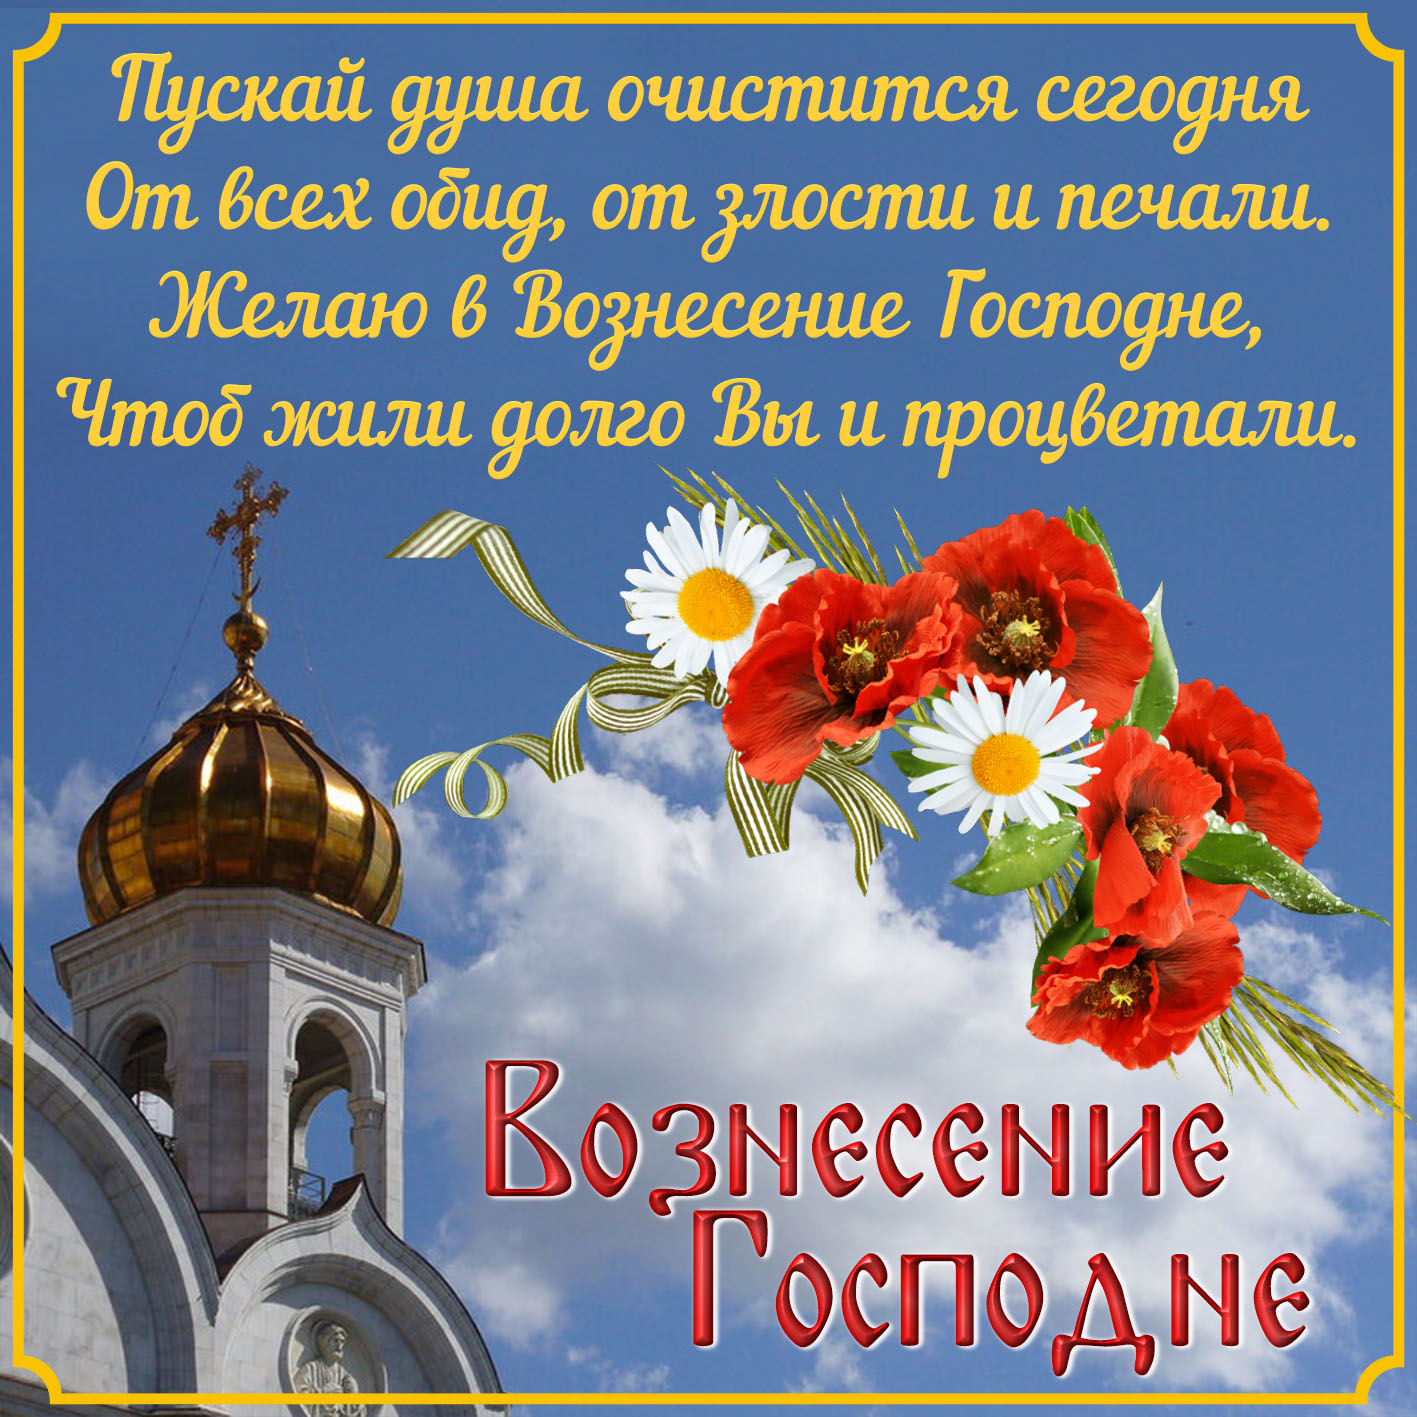 Открытка - пожелание на Вознесение Господне на фоне храма